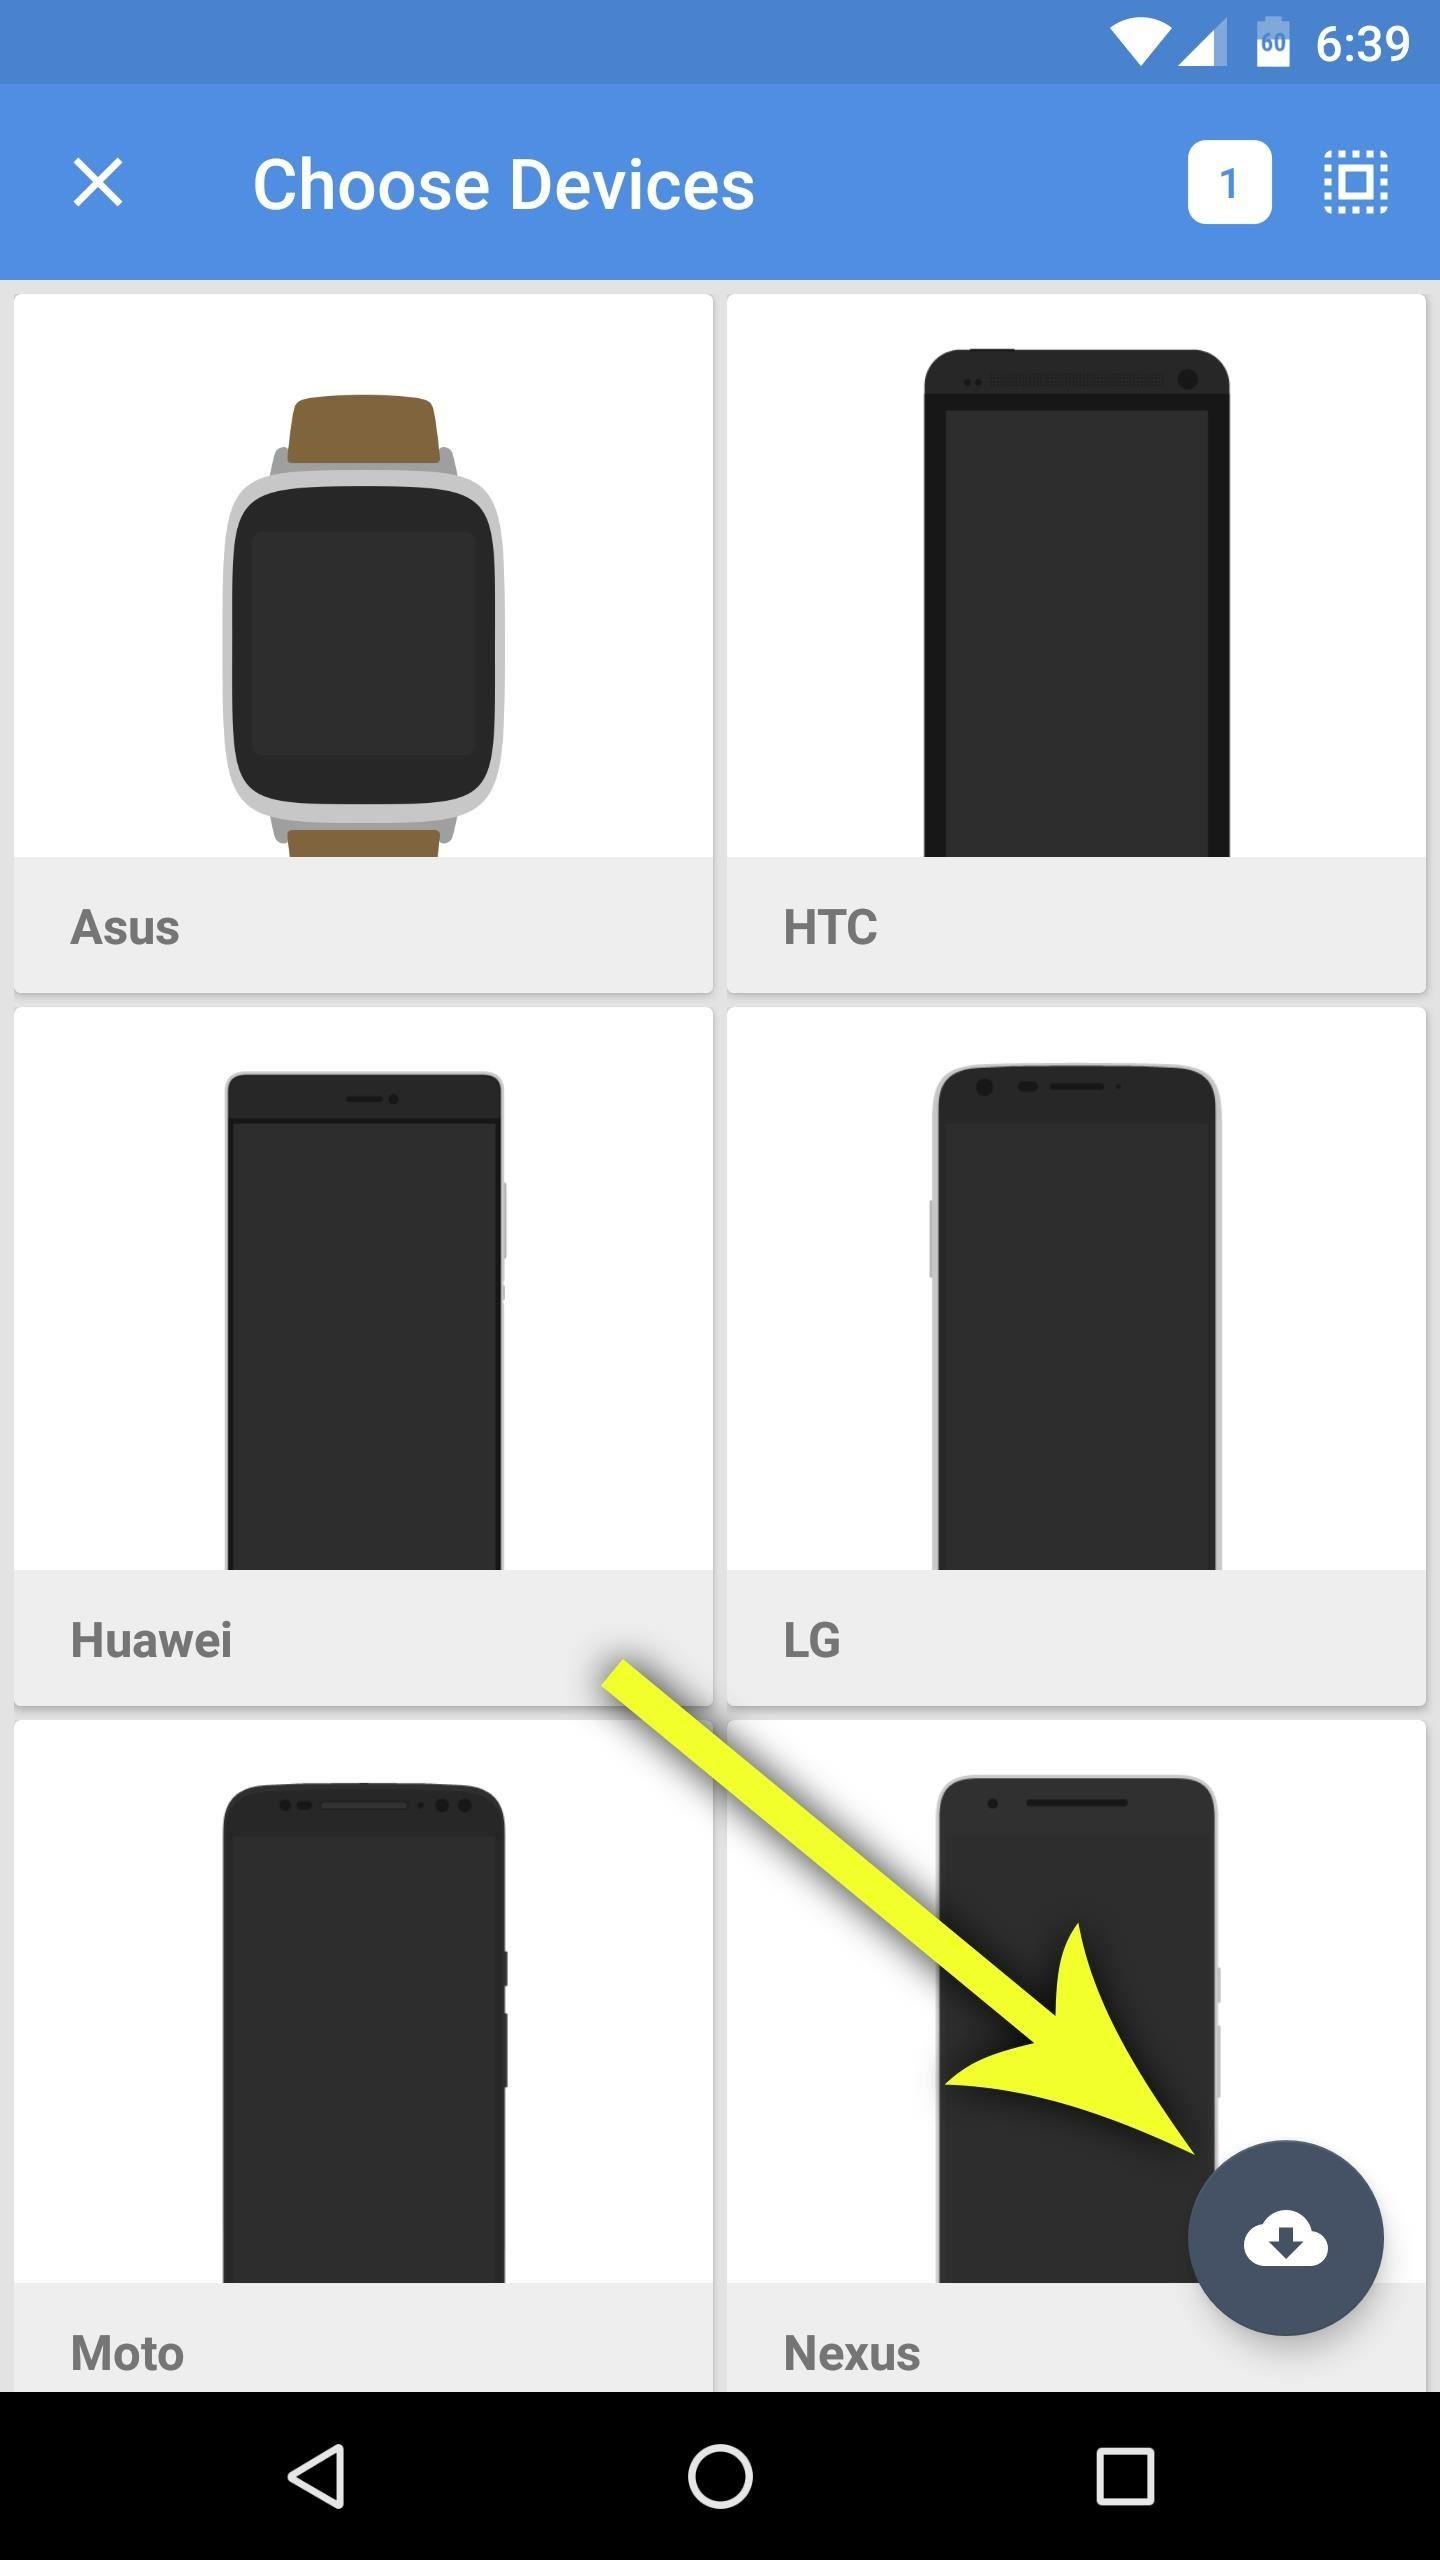 Jazz Up Boring Screenshots with Phone Frames & Custom Backgrounds